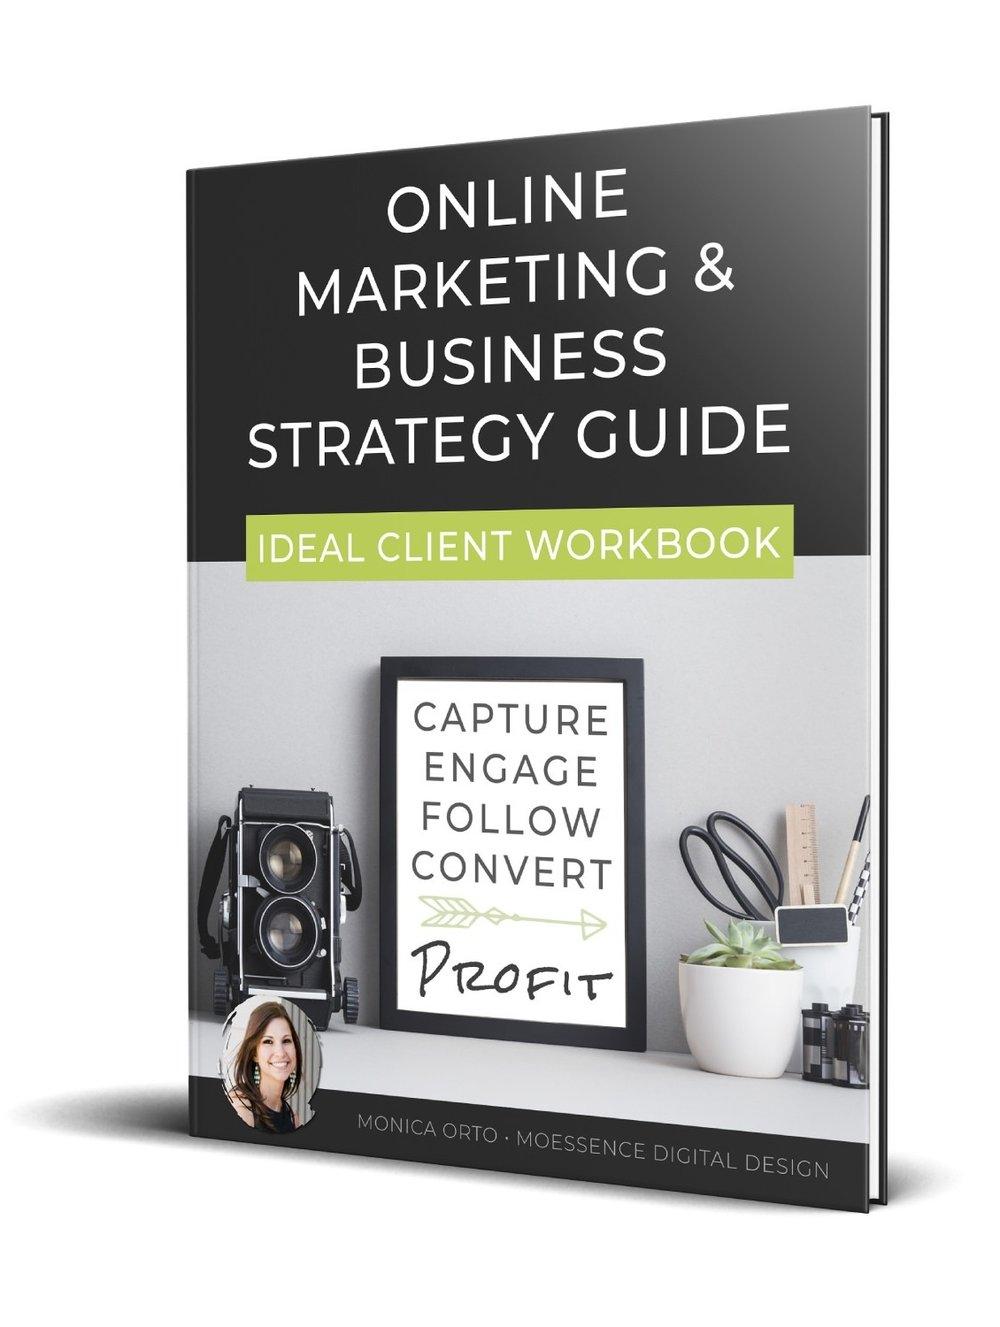 Online-Marketing-and-Business-Strategy-Guide-Ideal-Client-Workbook-Moessence-Digital-Design-moessence.com-guide-worksheet.jpg